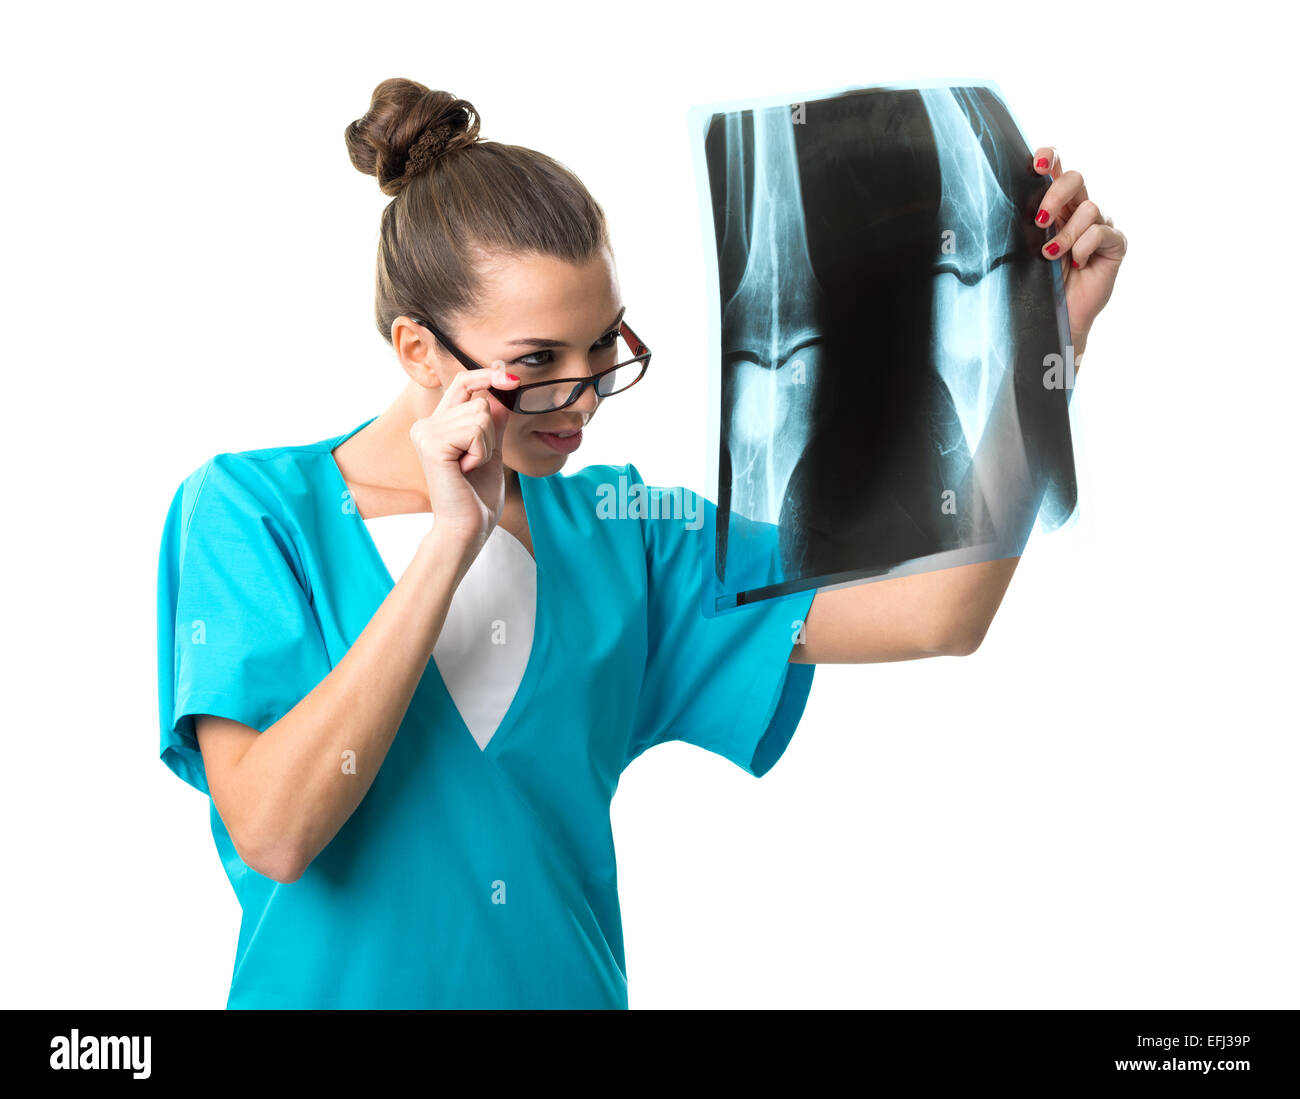 Beautiful radiologist looking at x-ray image - Stock Image